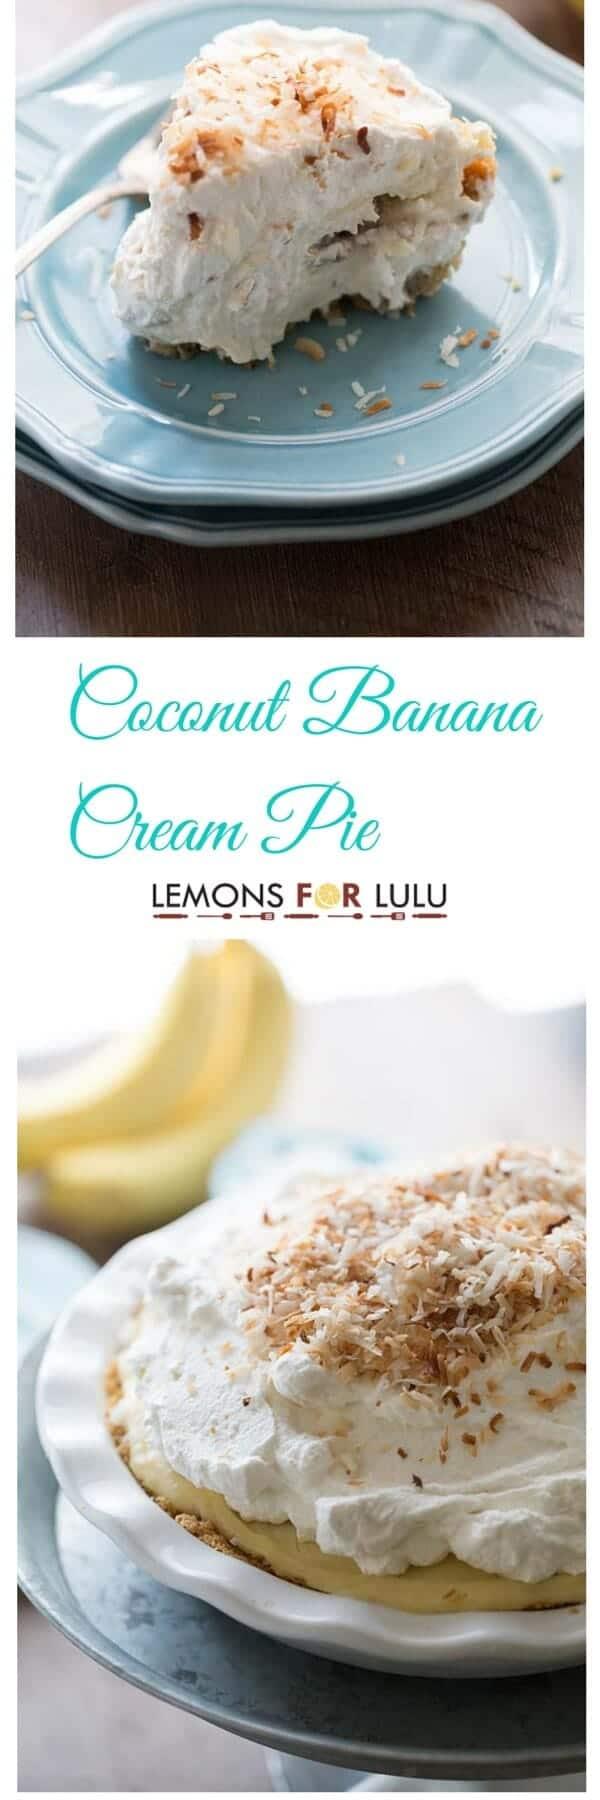 Coconut Banana Cream Pie - LemonsforLulu.com